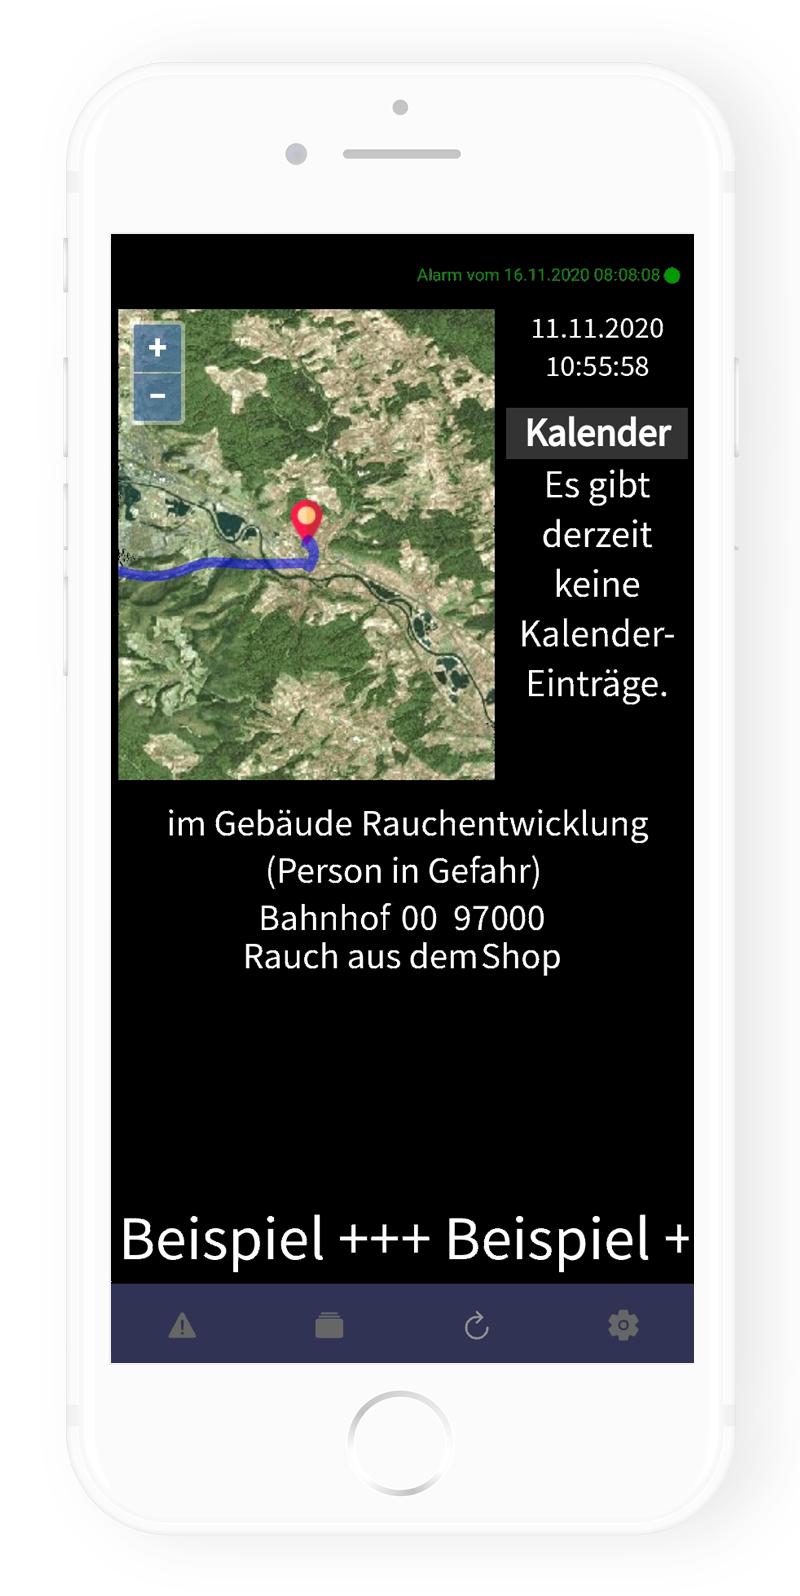 Frey Group - App: Alarmmonitor